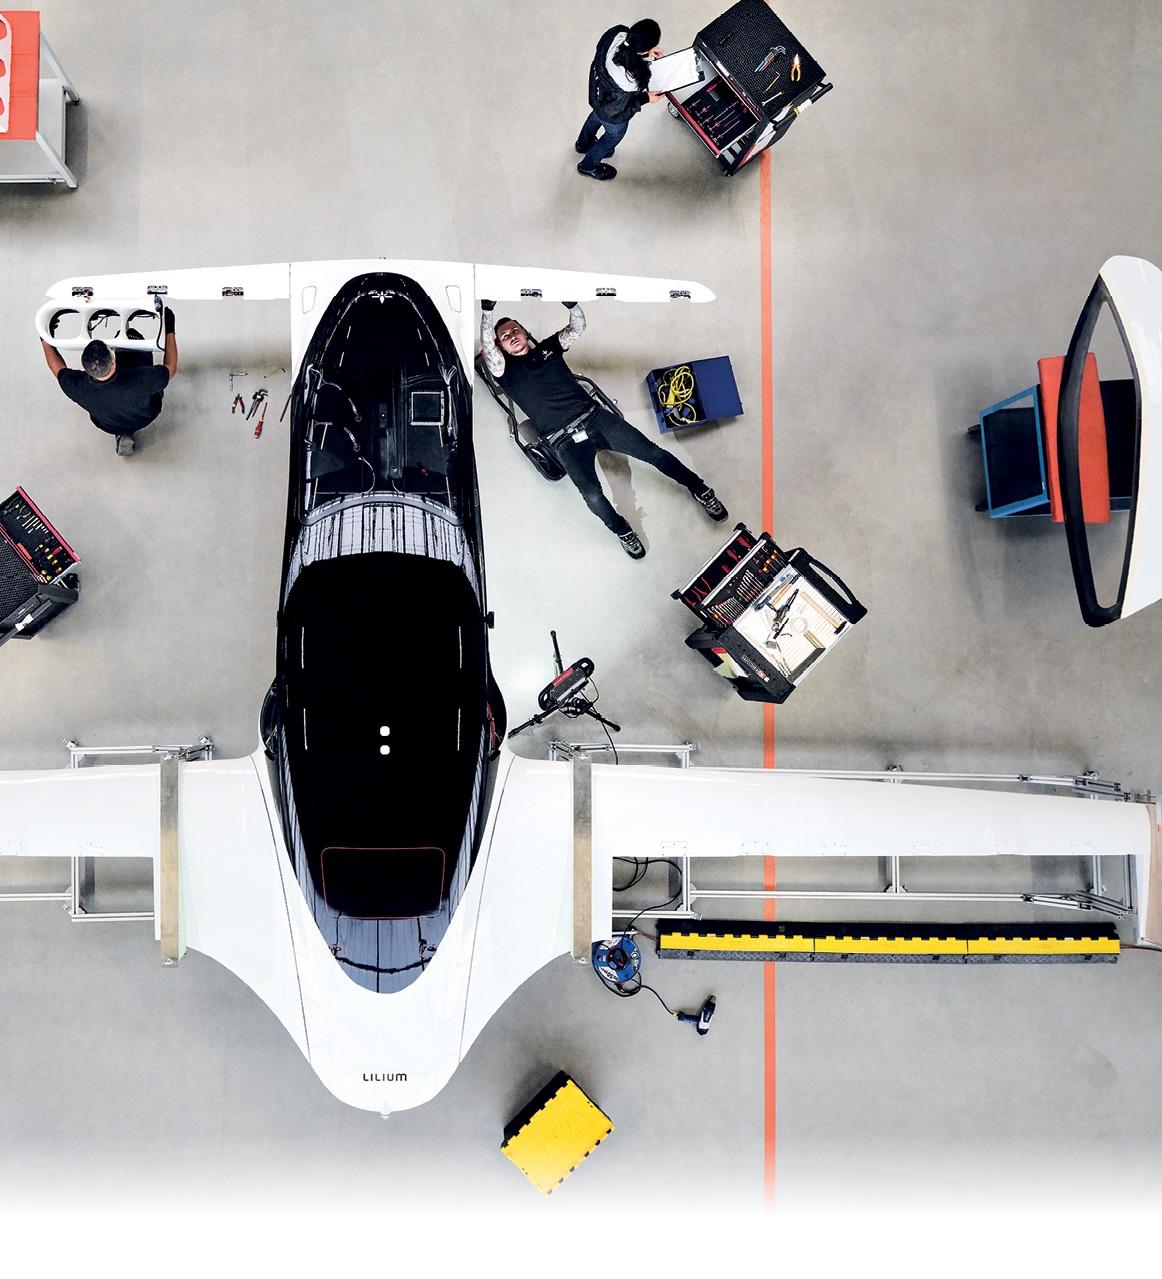 Lilium Jet Engineers